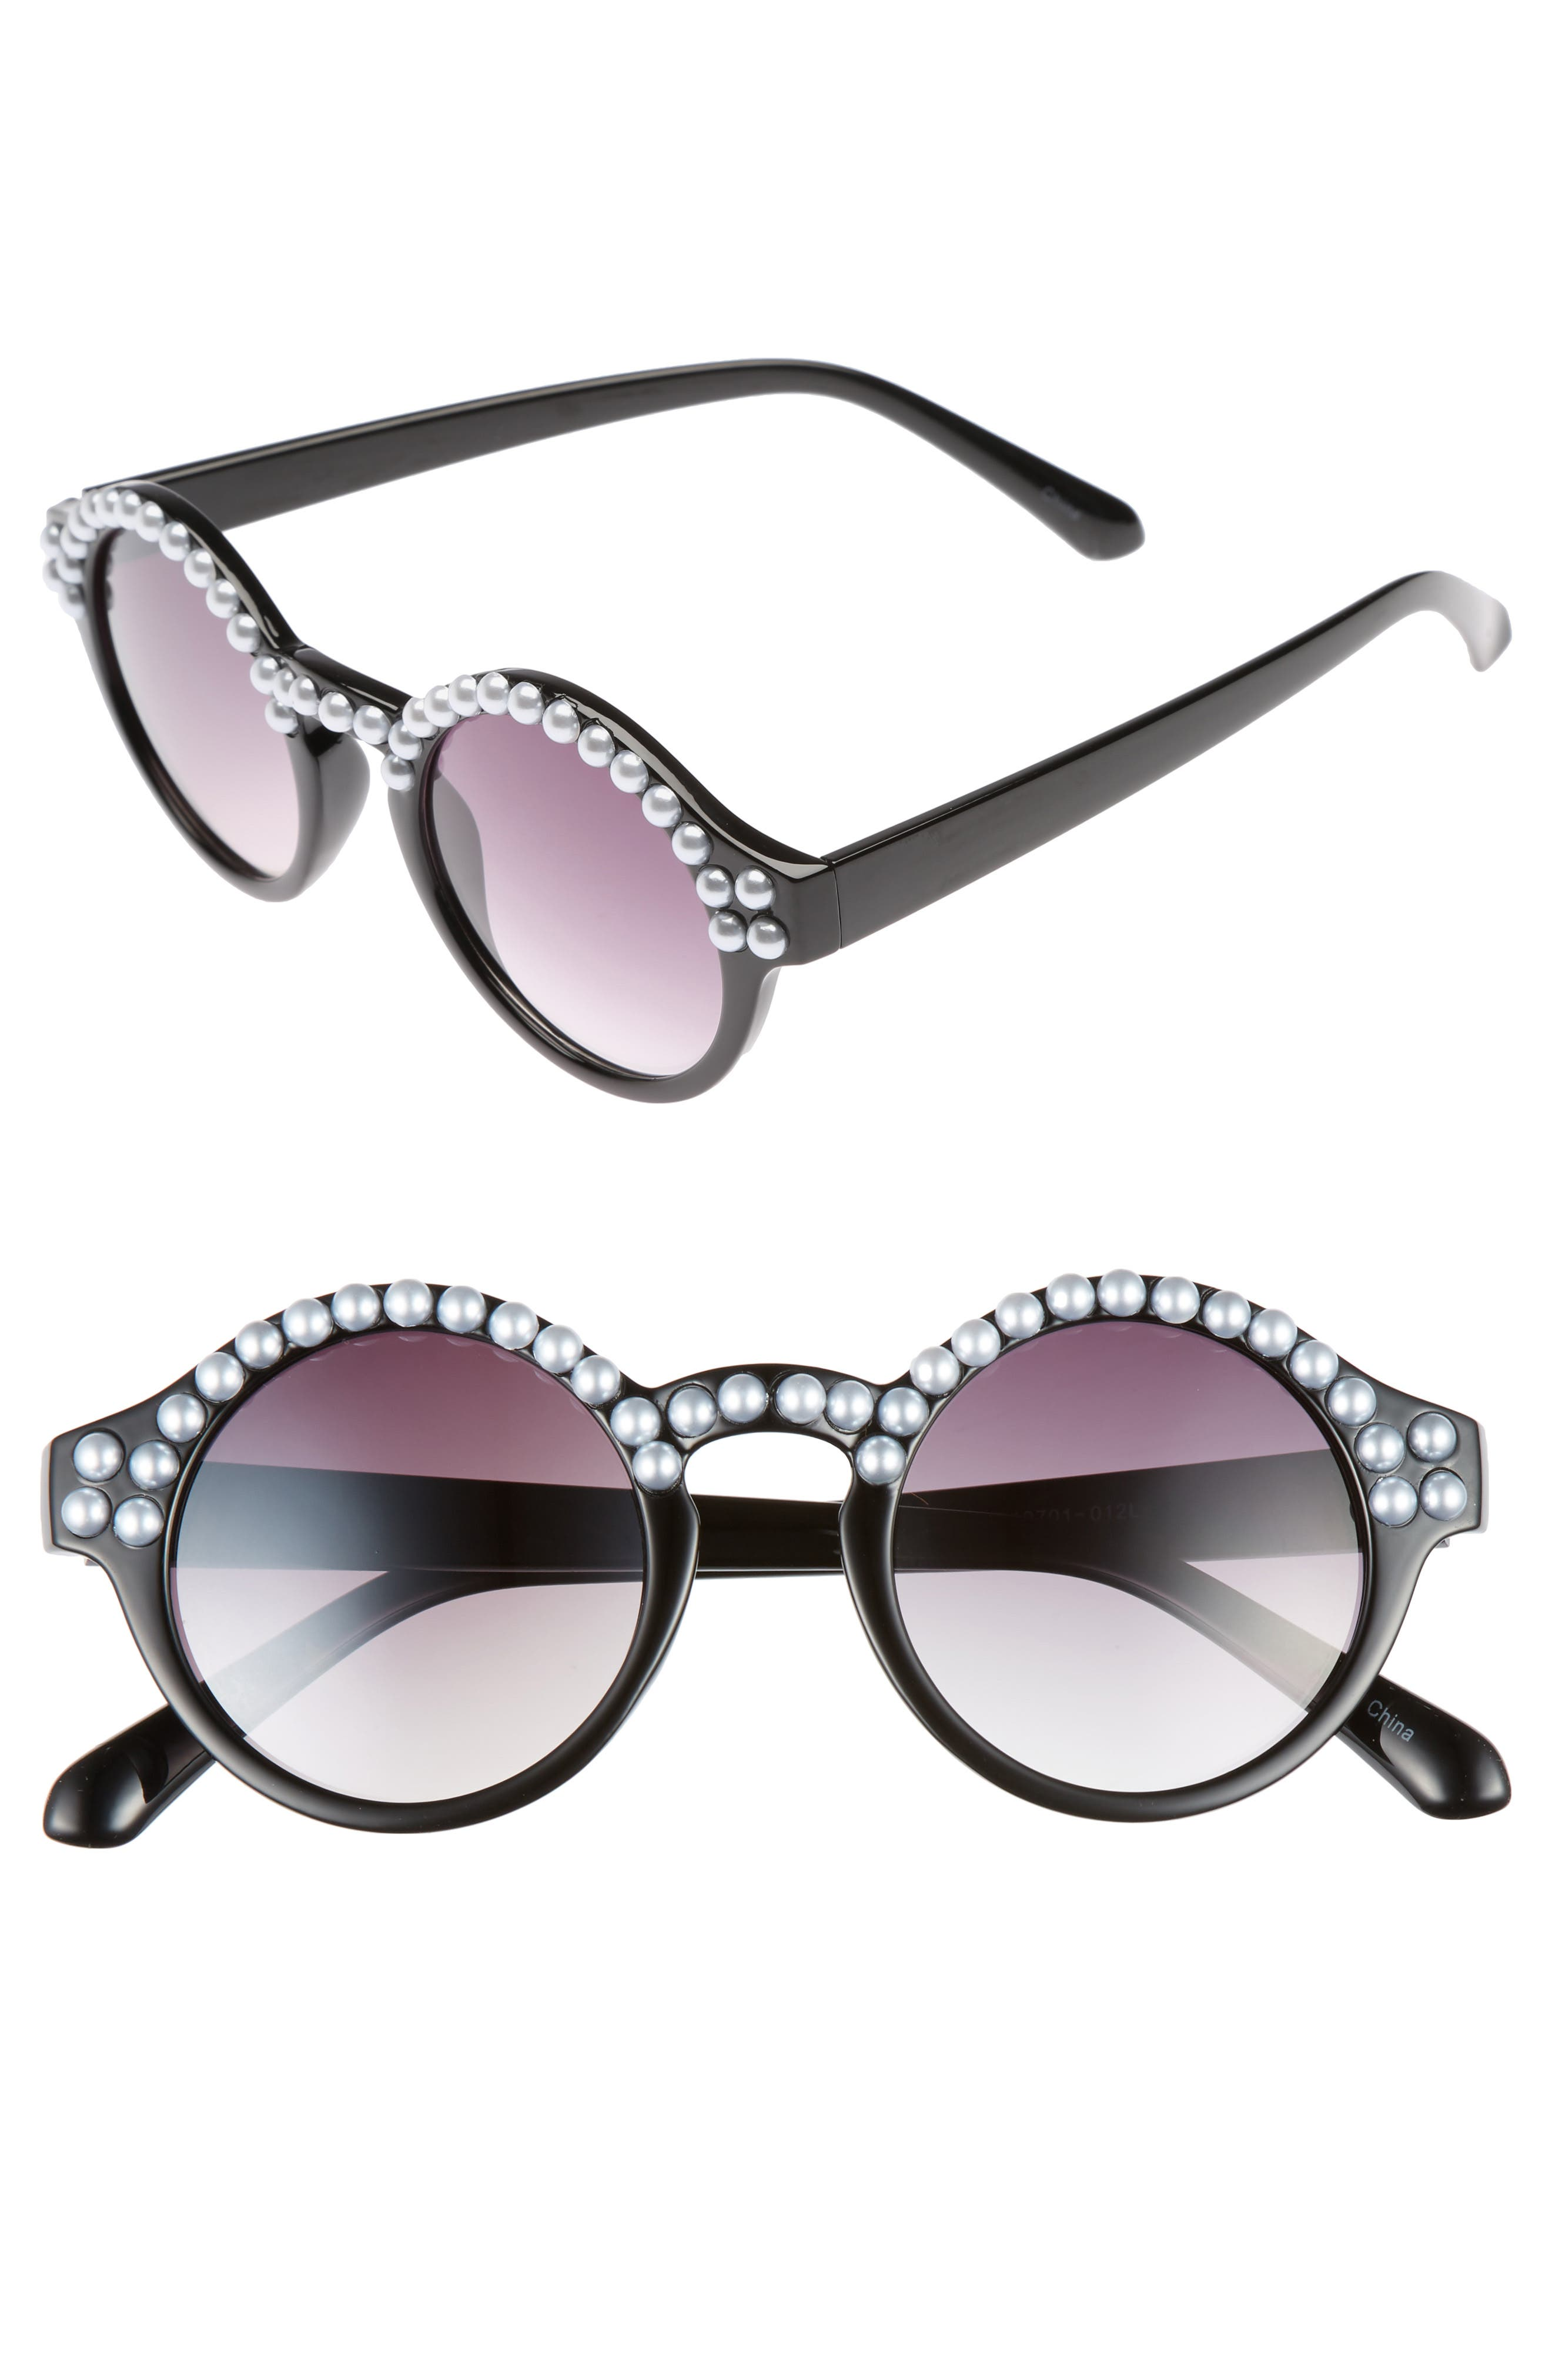 Main Image - BP. 45mm Imitation Pearl Round Sunglasses